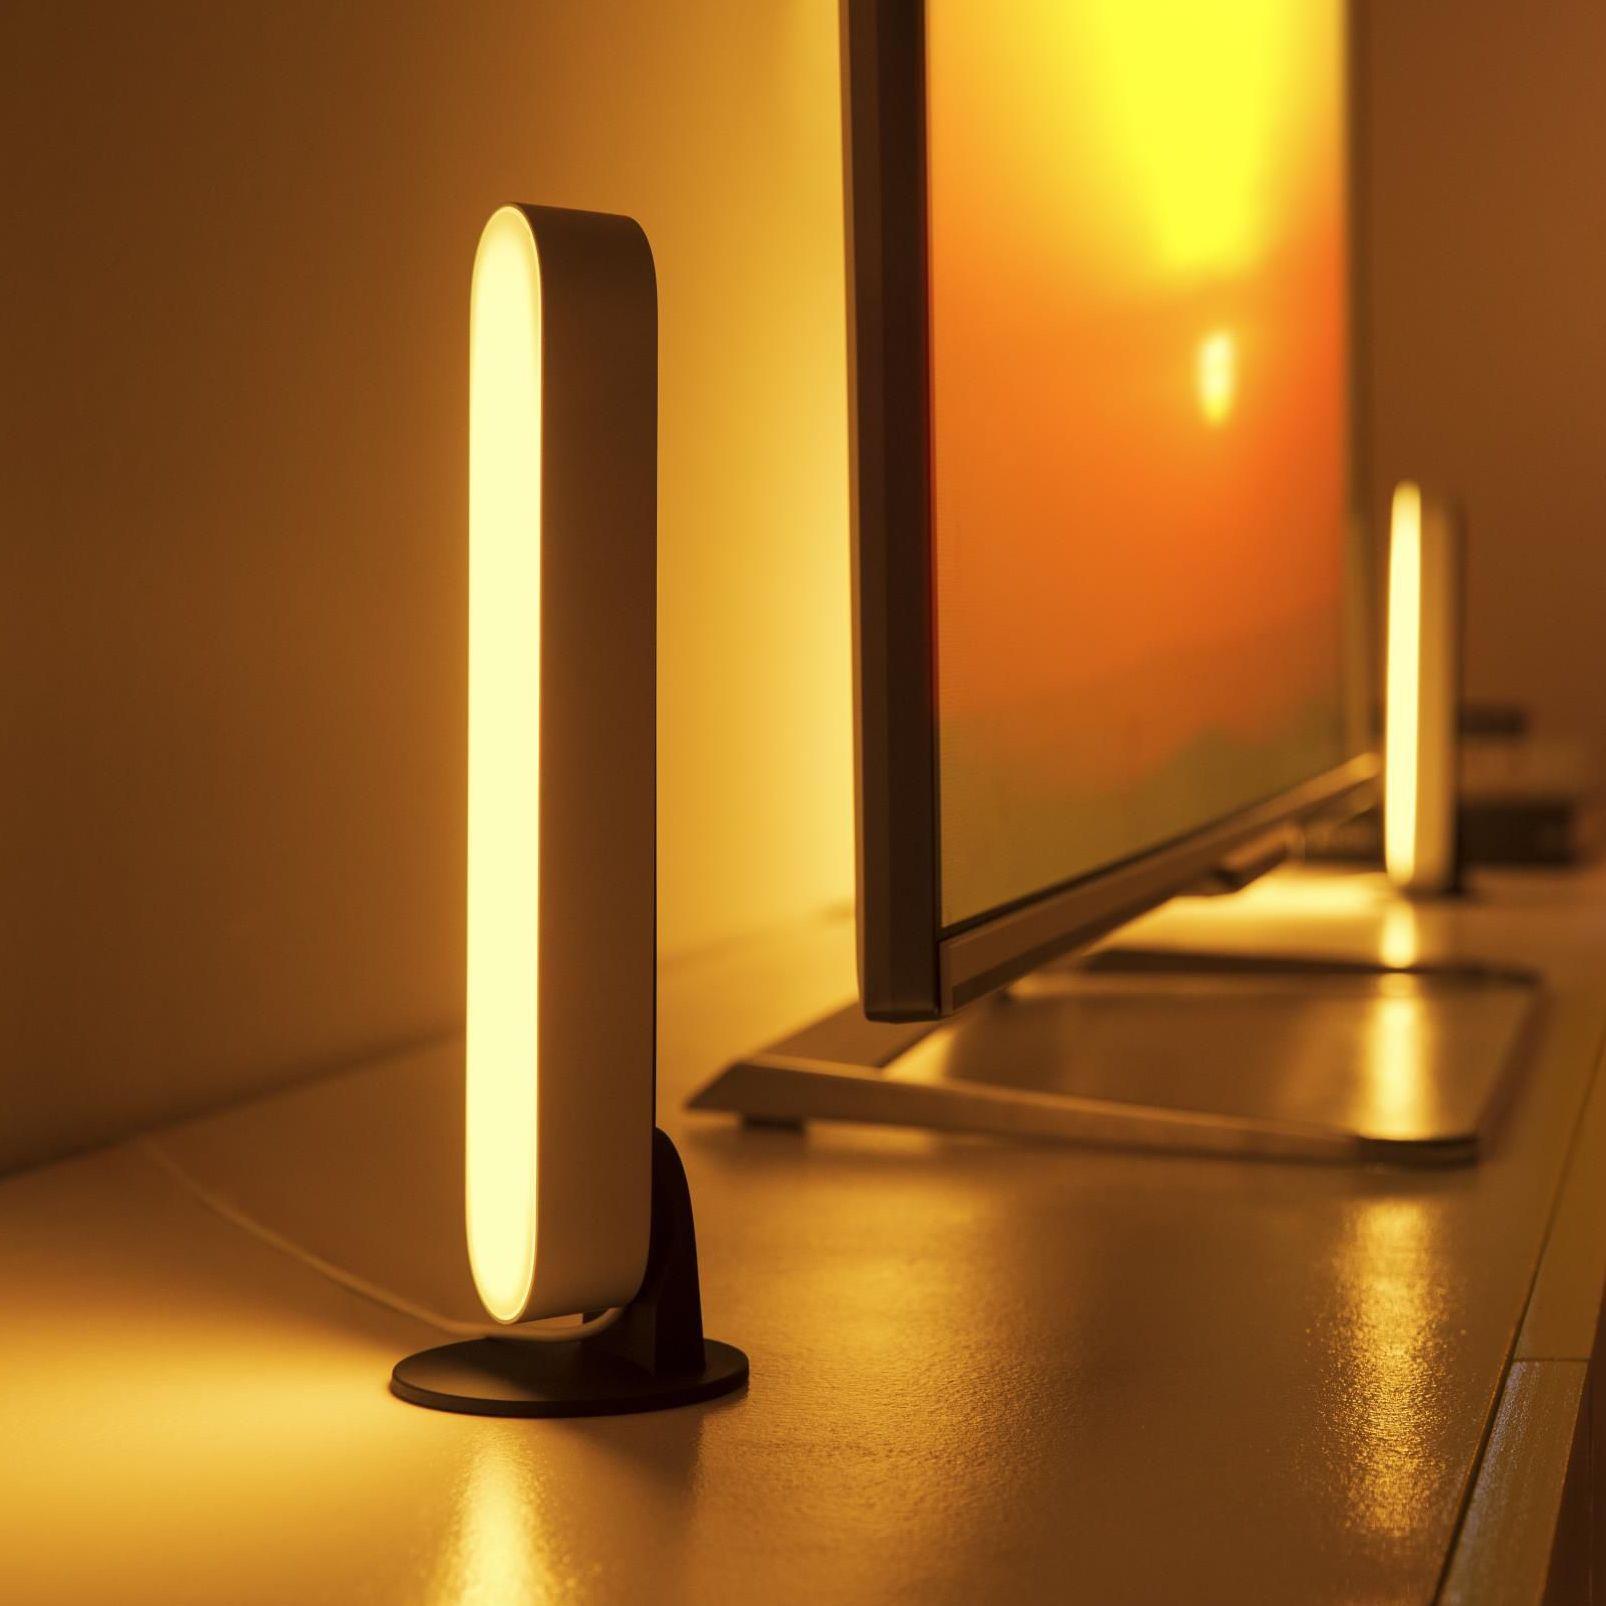 Philips Hue Badezimmer Spiegel: Philips Hue Lightbar